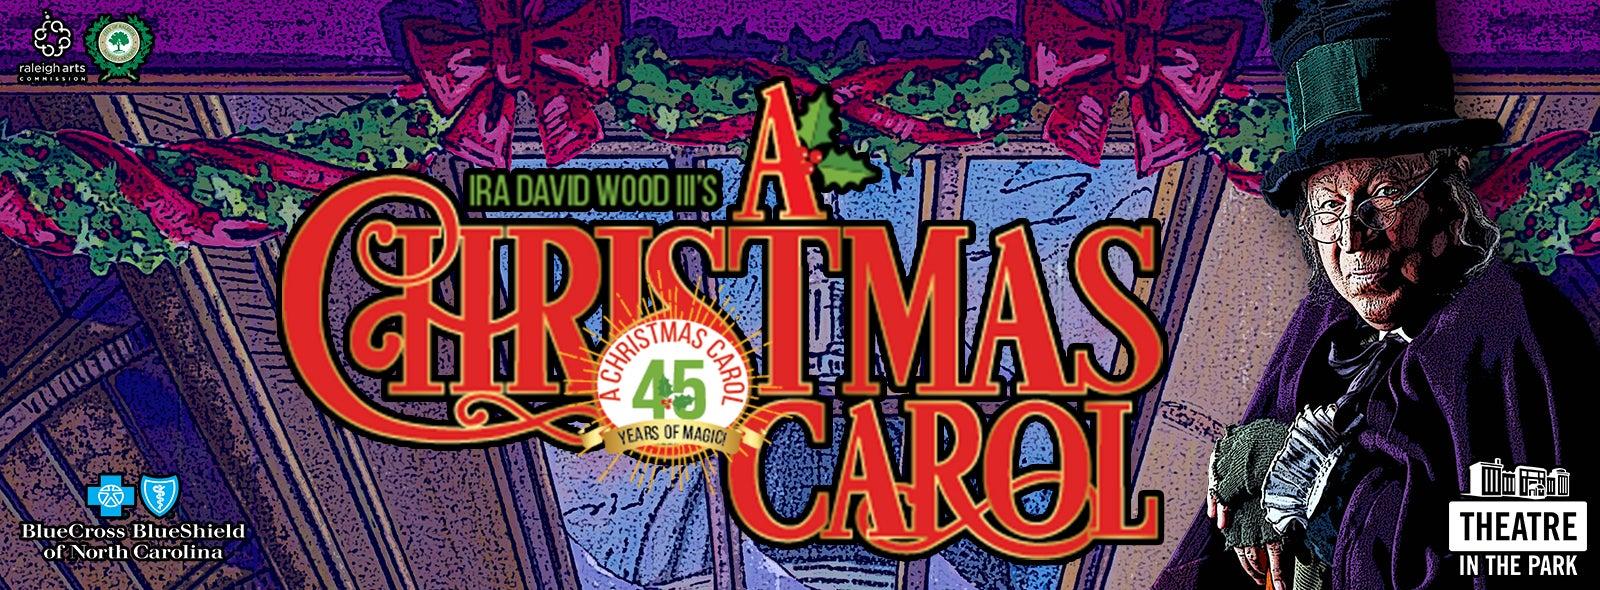 A Christmas Carol 2019 1600x590.jpg